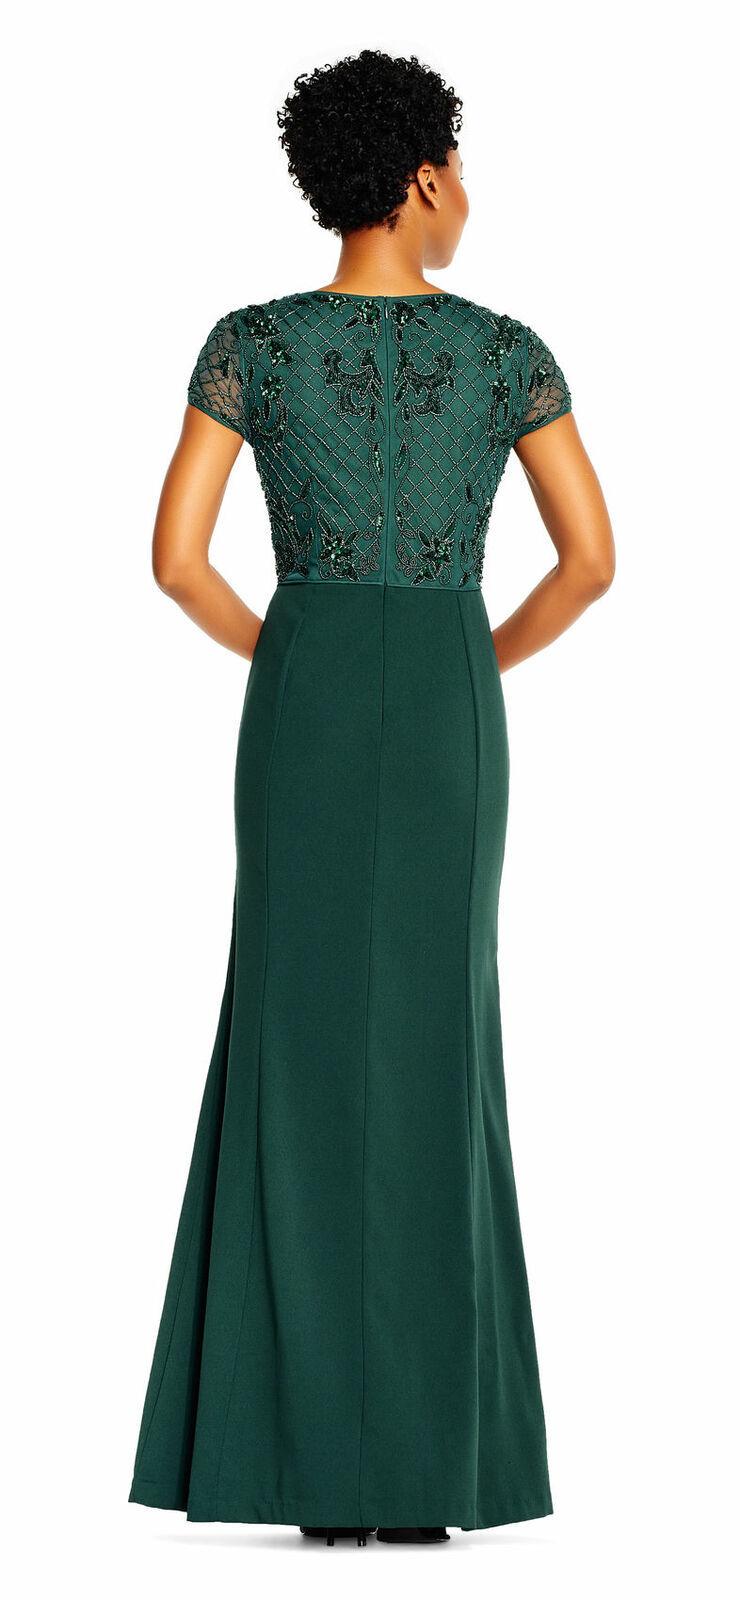 Adrianna Papell Short Sleeve Mermaid Gown Beaded Bodice, Dusty Emerald, 22W